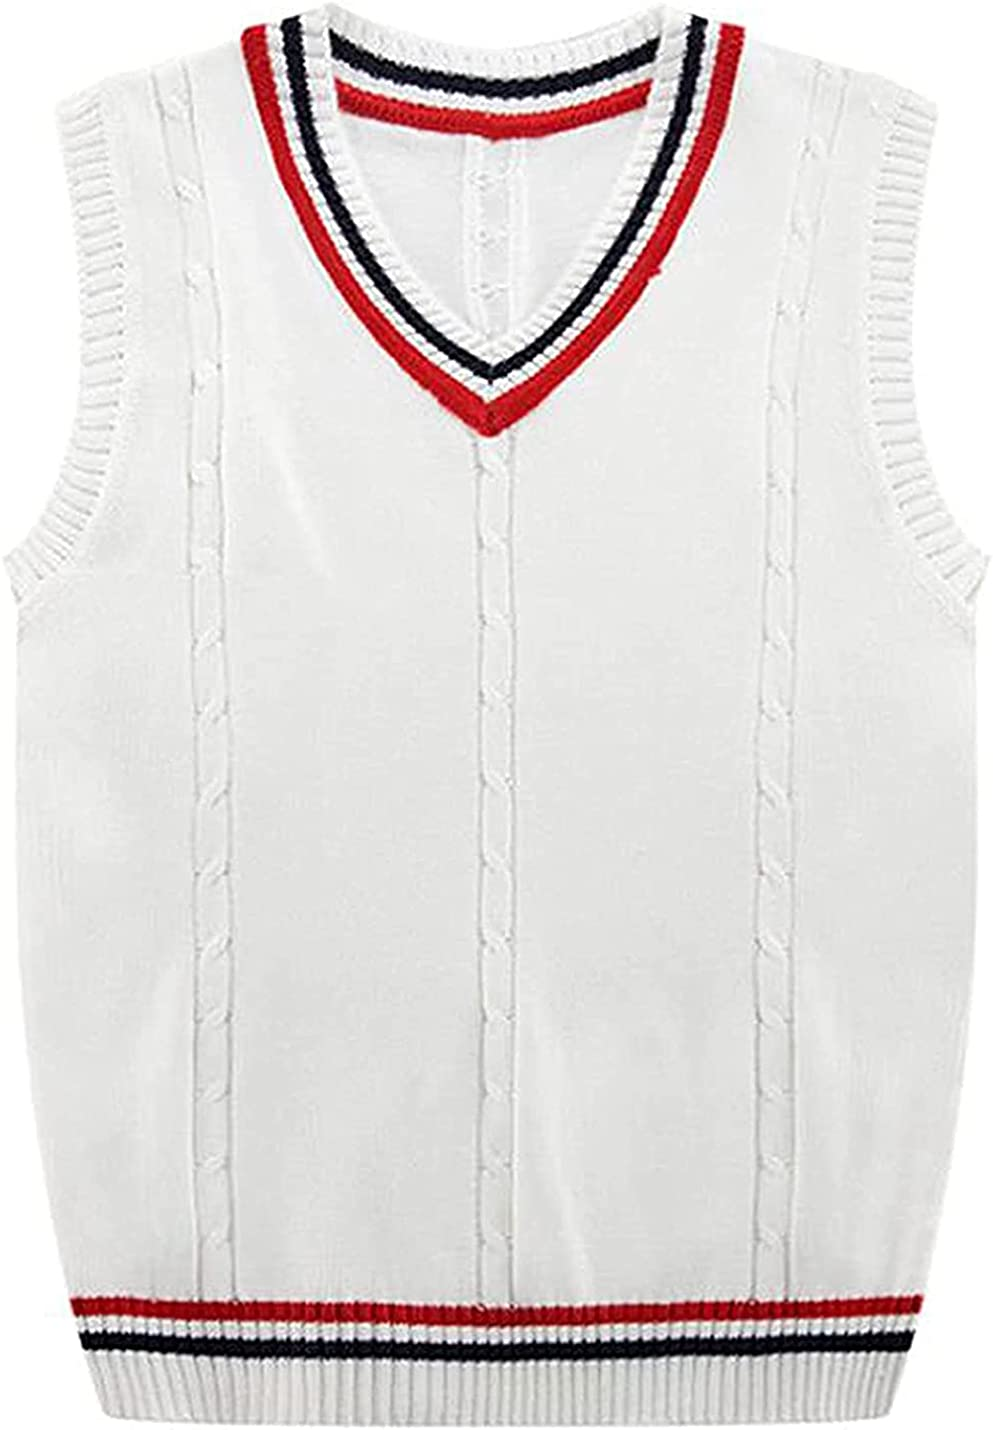 PAODIKUAI Men's Casual Knitted V-Neck Vest JK Uniform Sleeveless Sweater Vest Pullover